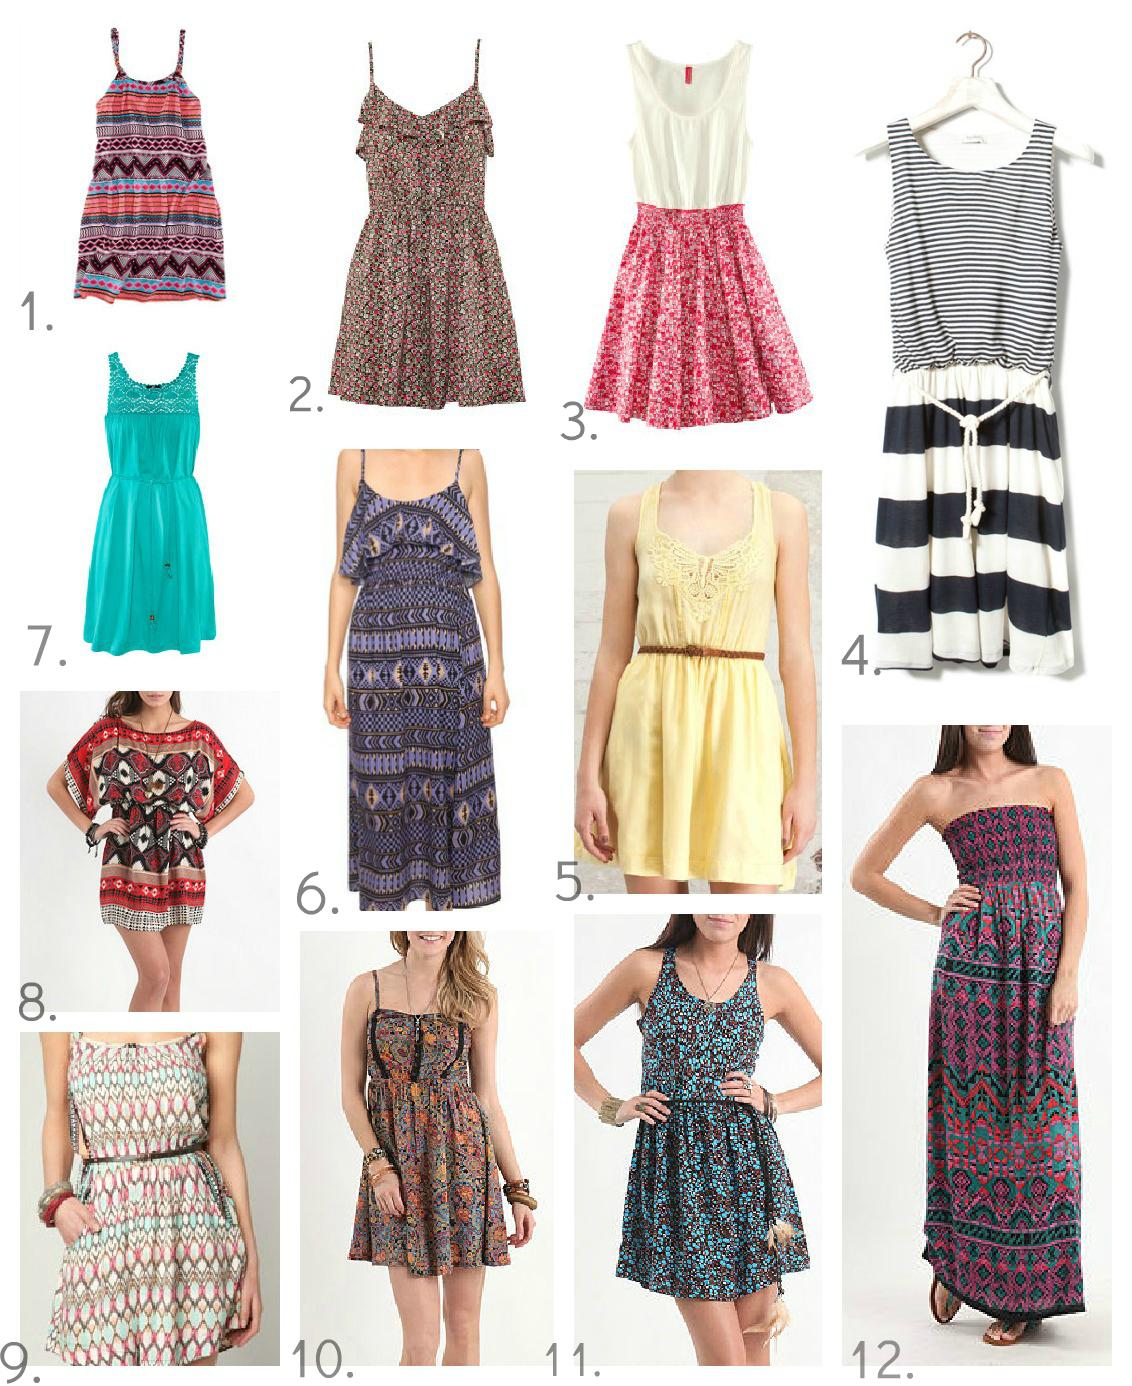 b h s summer dresses